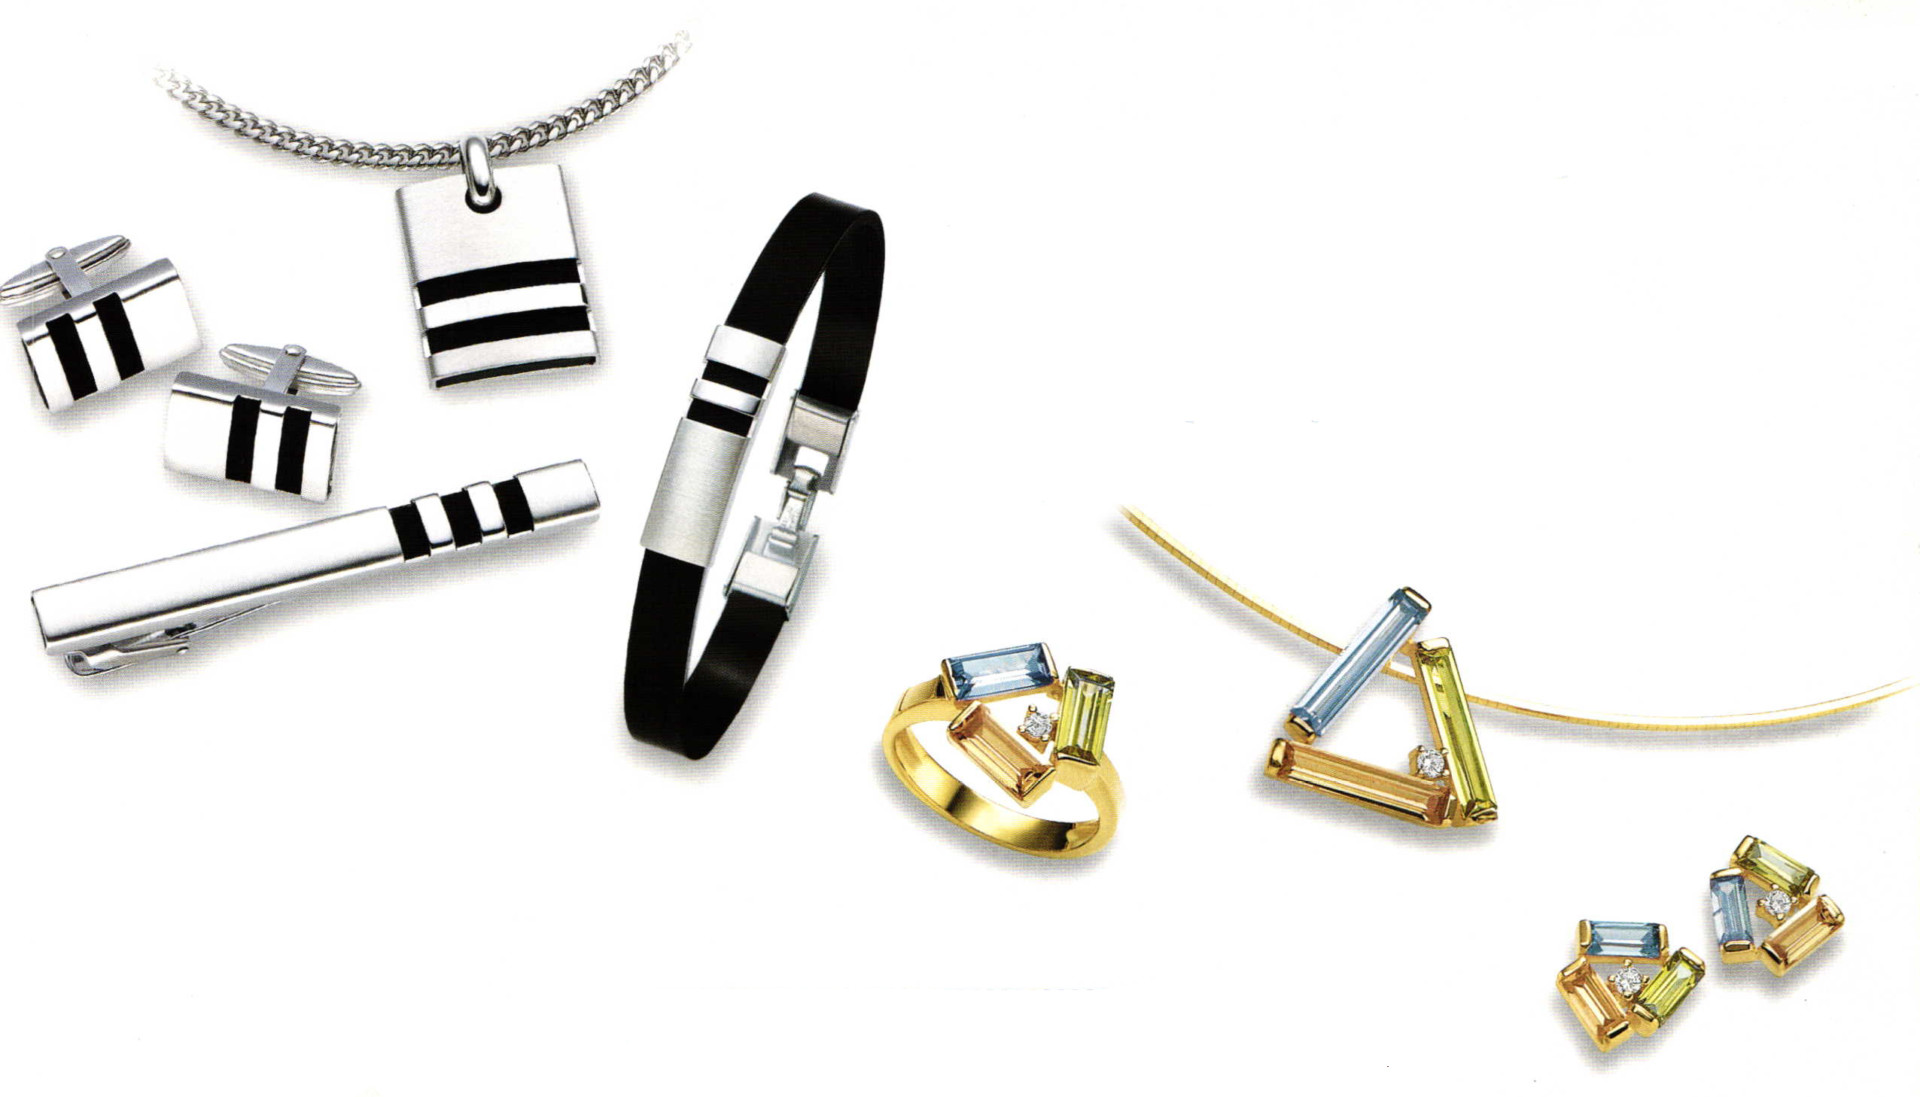 German Jewelry Quality And Creativity